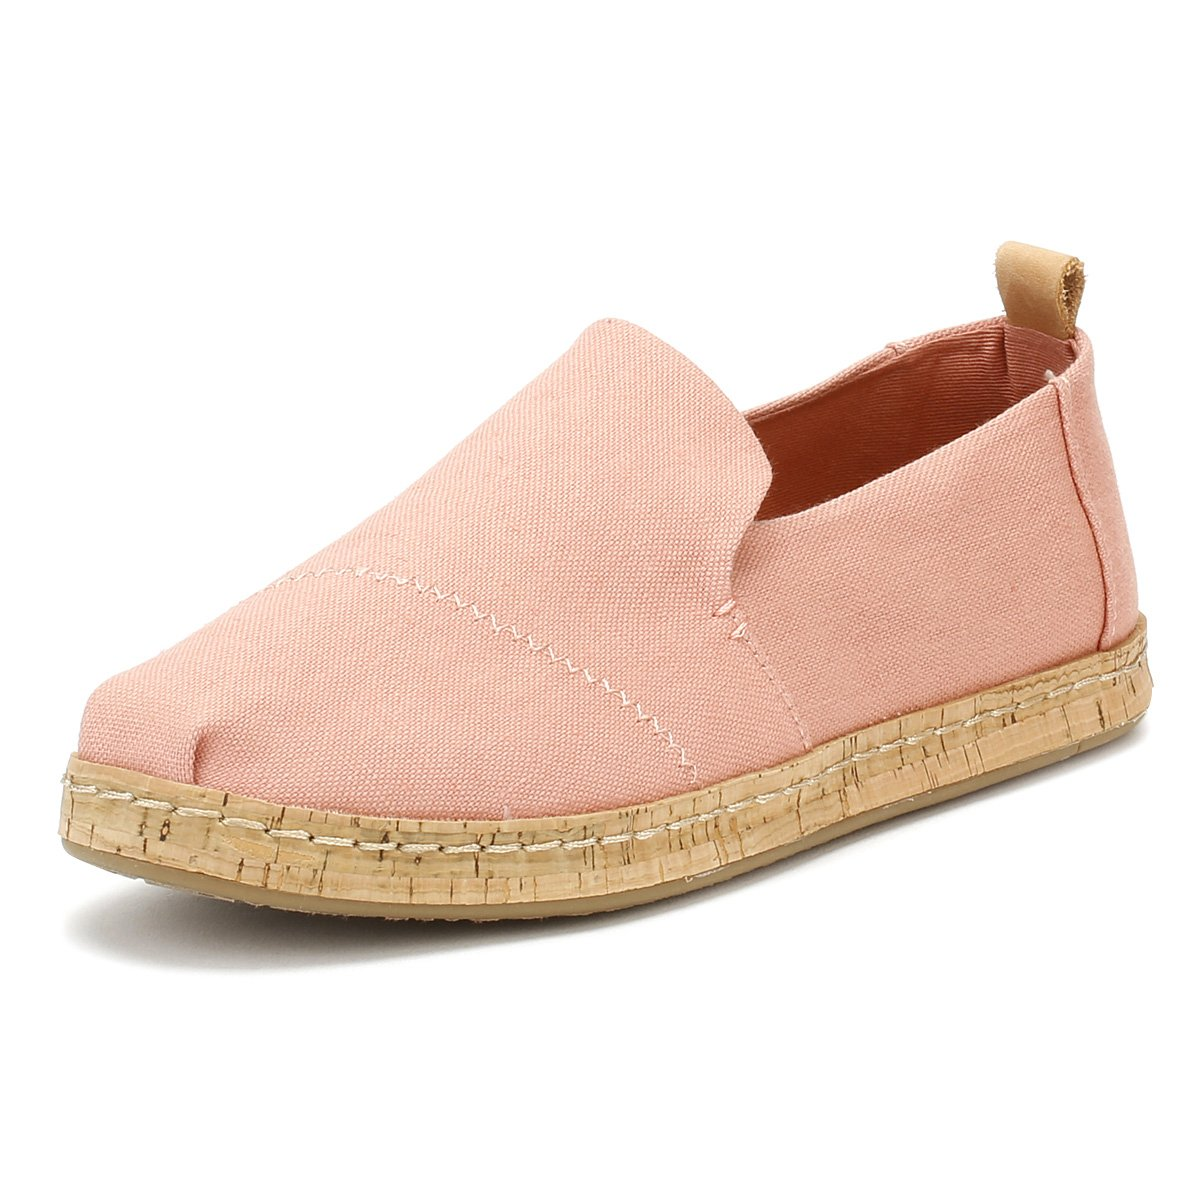 7fd51f33a Details about TOMS Women's Deconstructed Cork Alpargata Bloom Hemp Slip On  Shoes